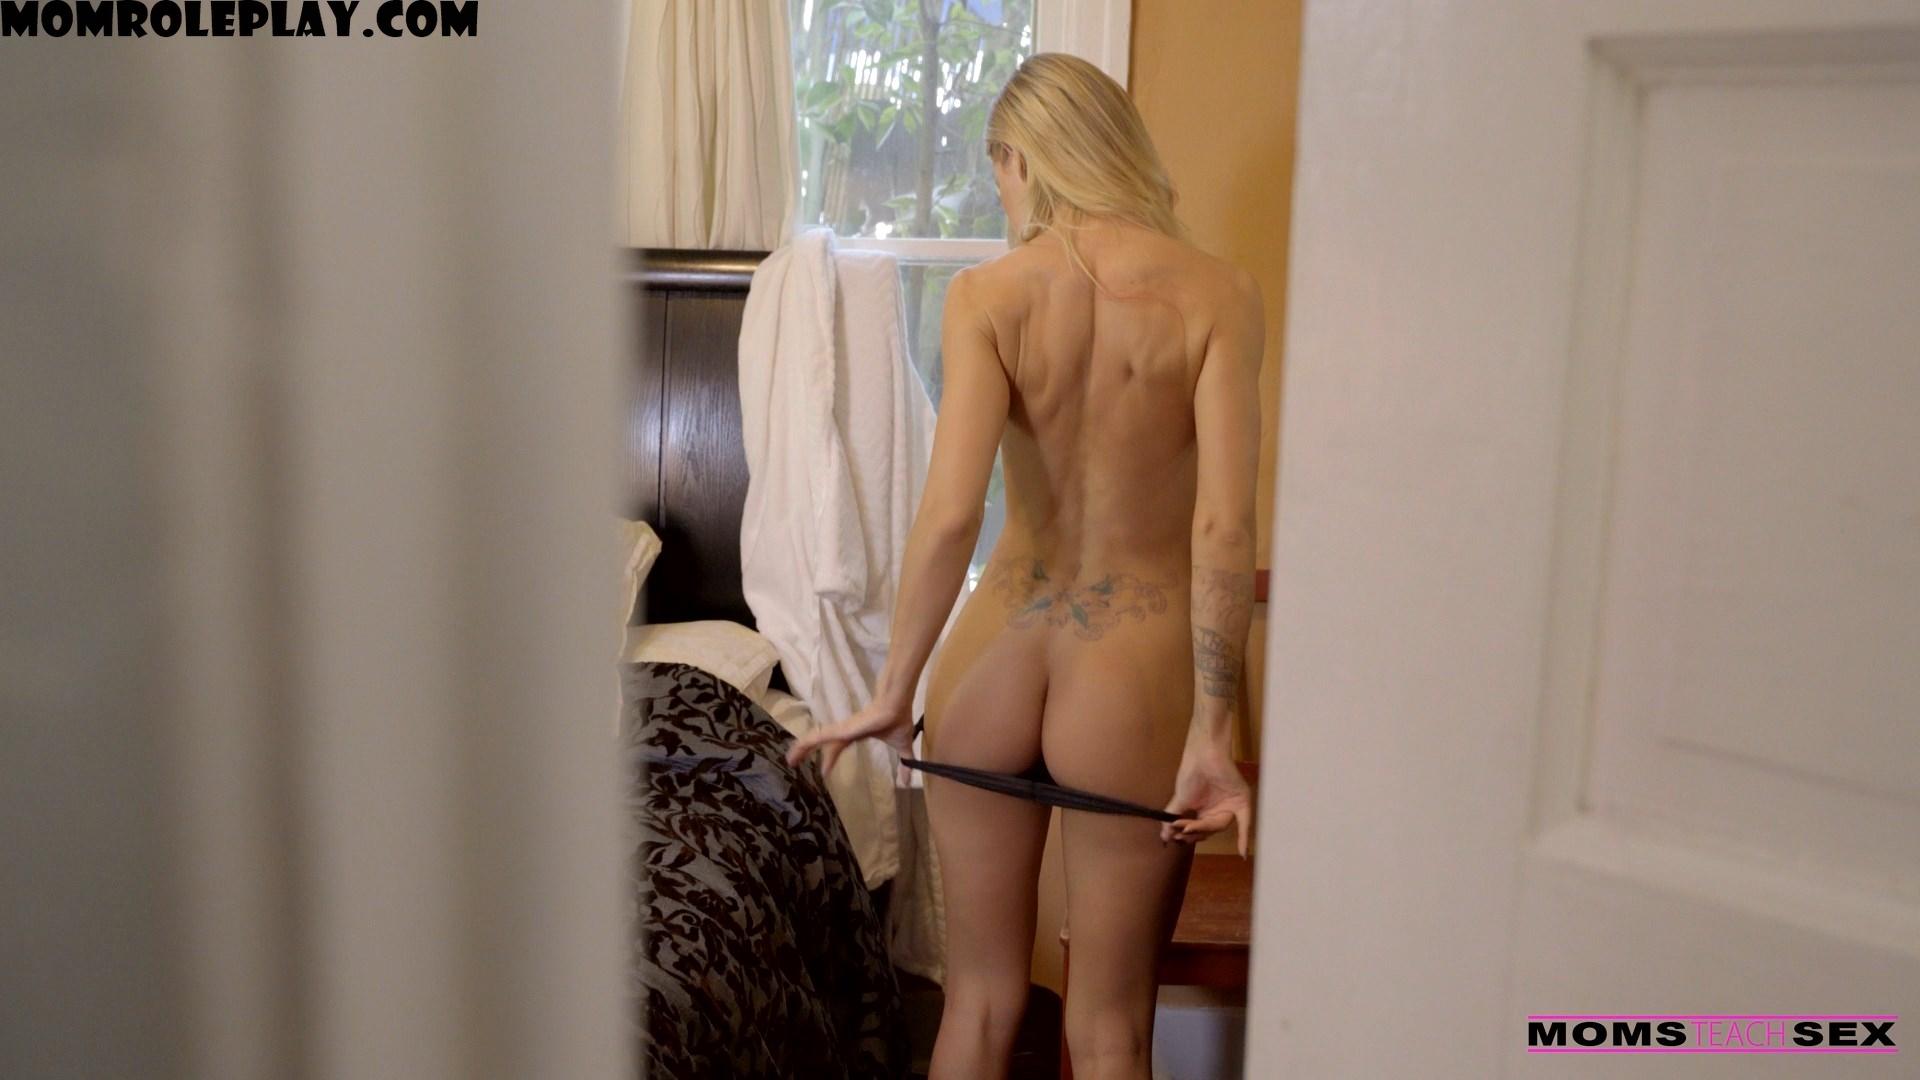 Moms Teach Sex - Jessa Rhodes - My Sexy Stepmom